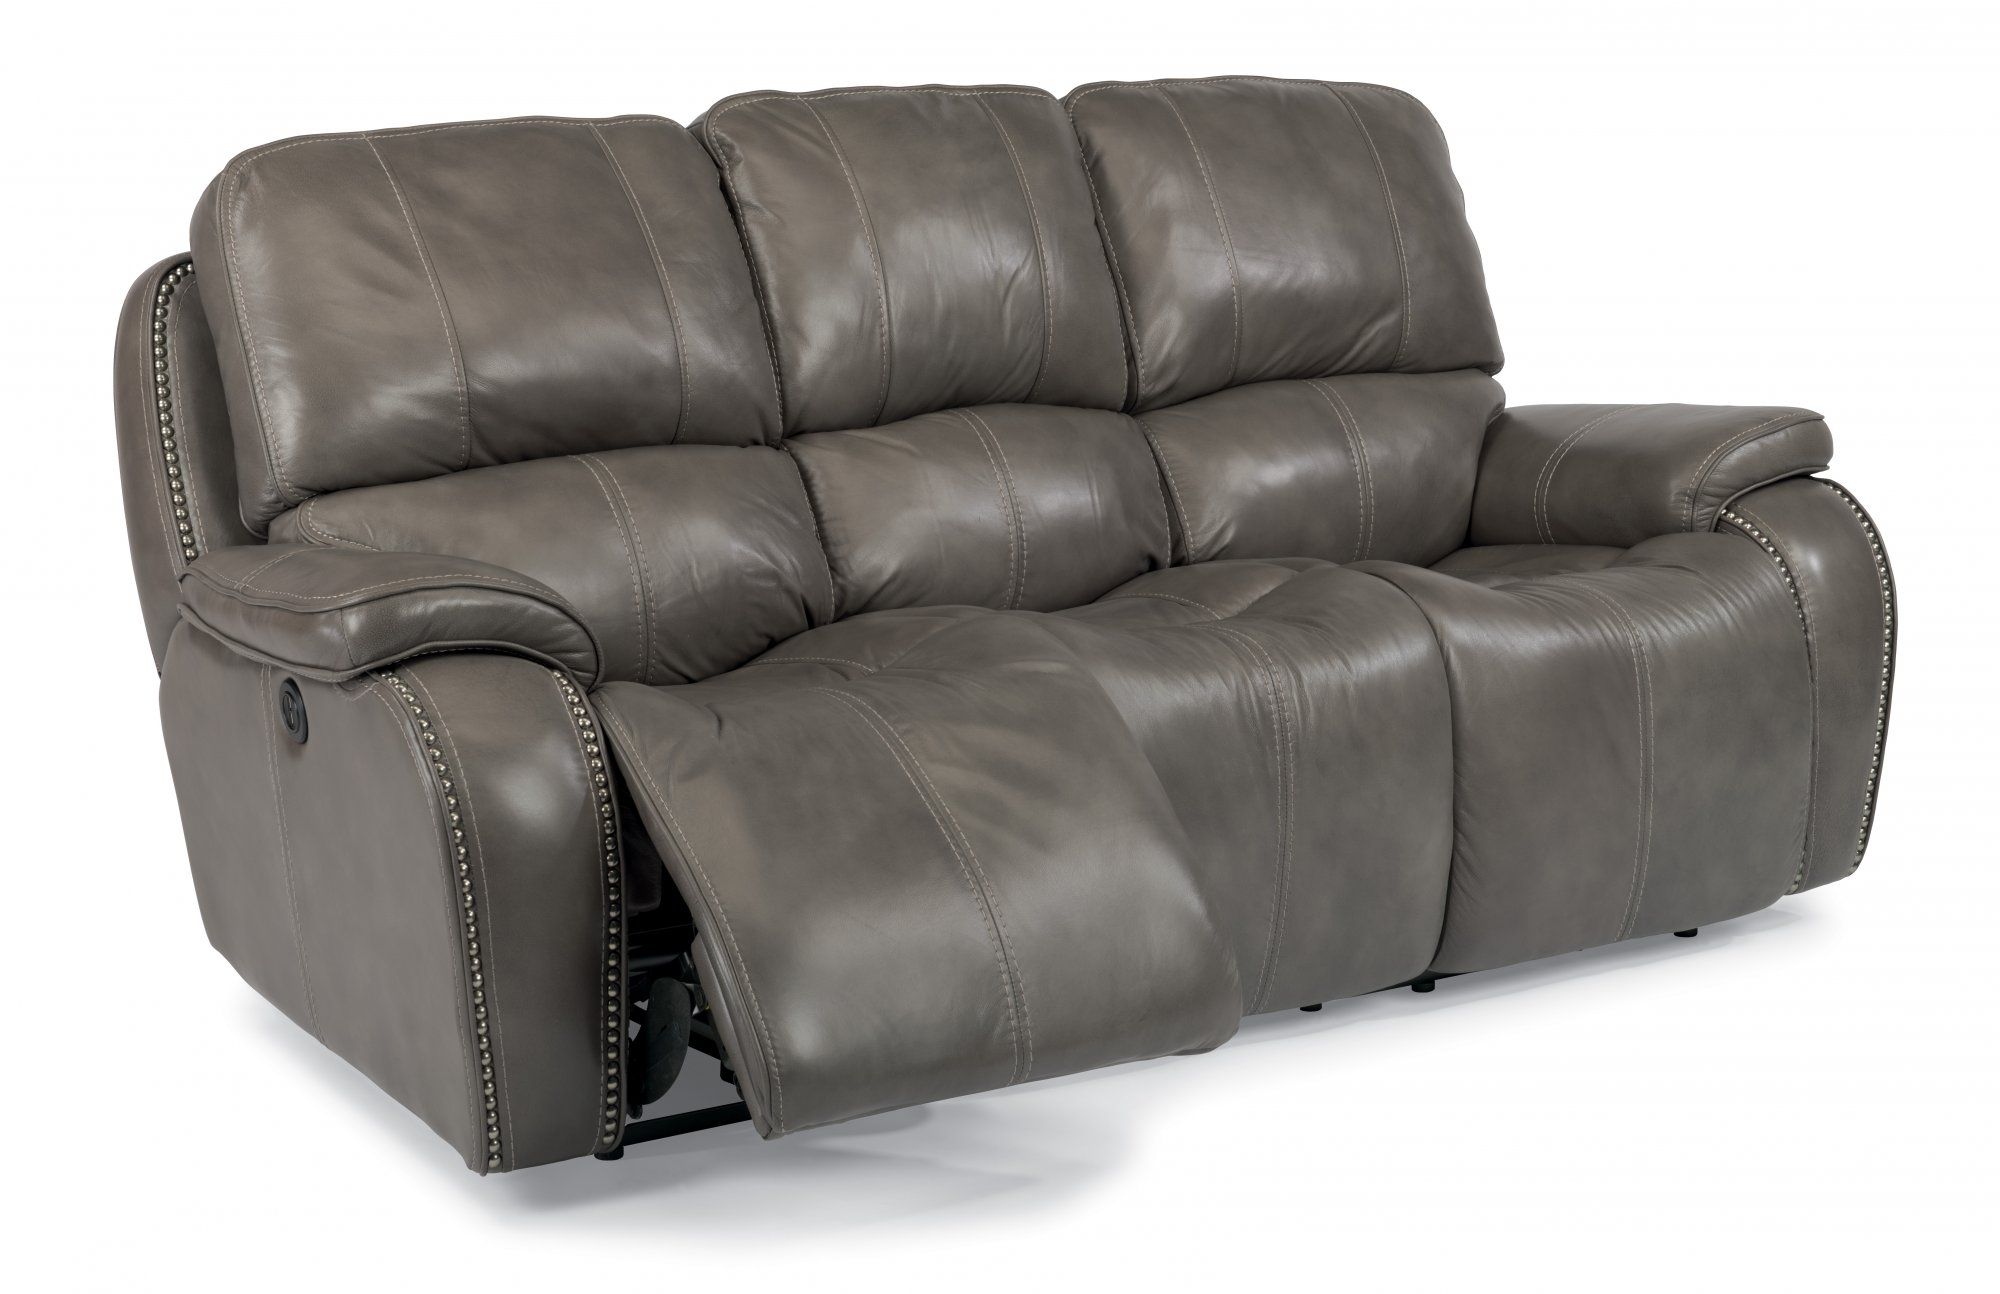 Model: 1617-62P | Flexsteel MacKay  Leather Power Reclining Sofa